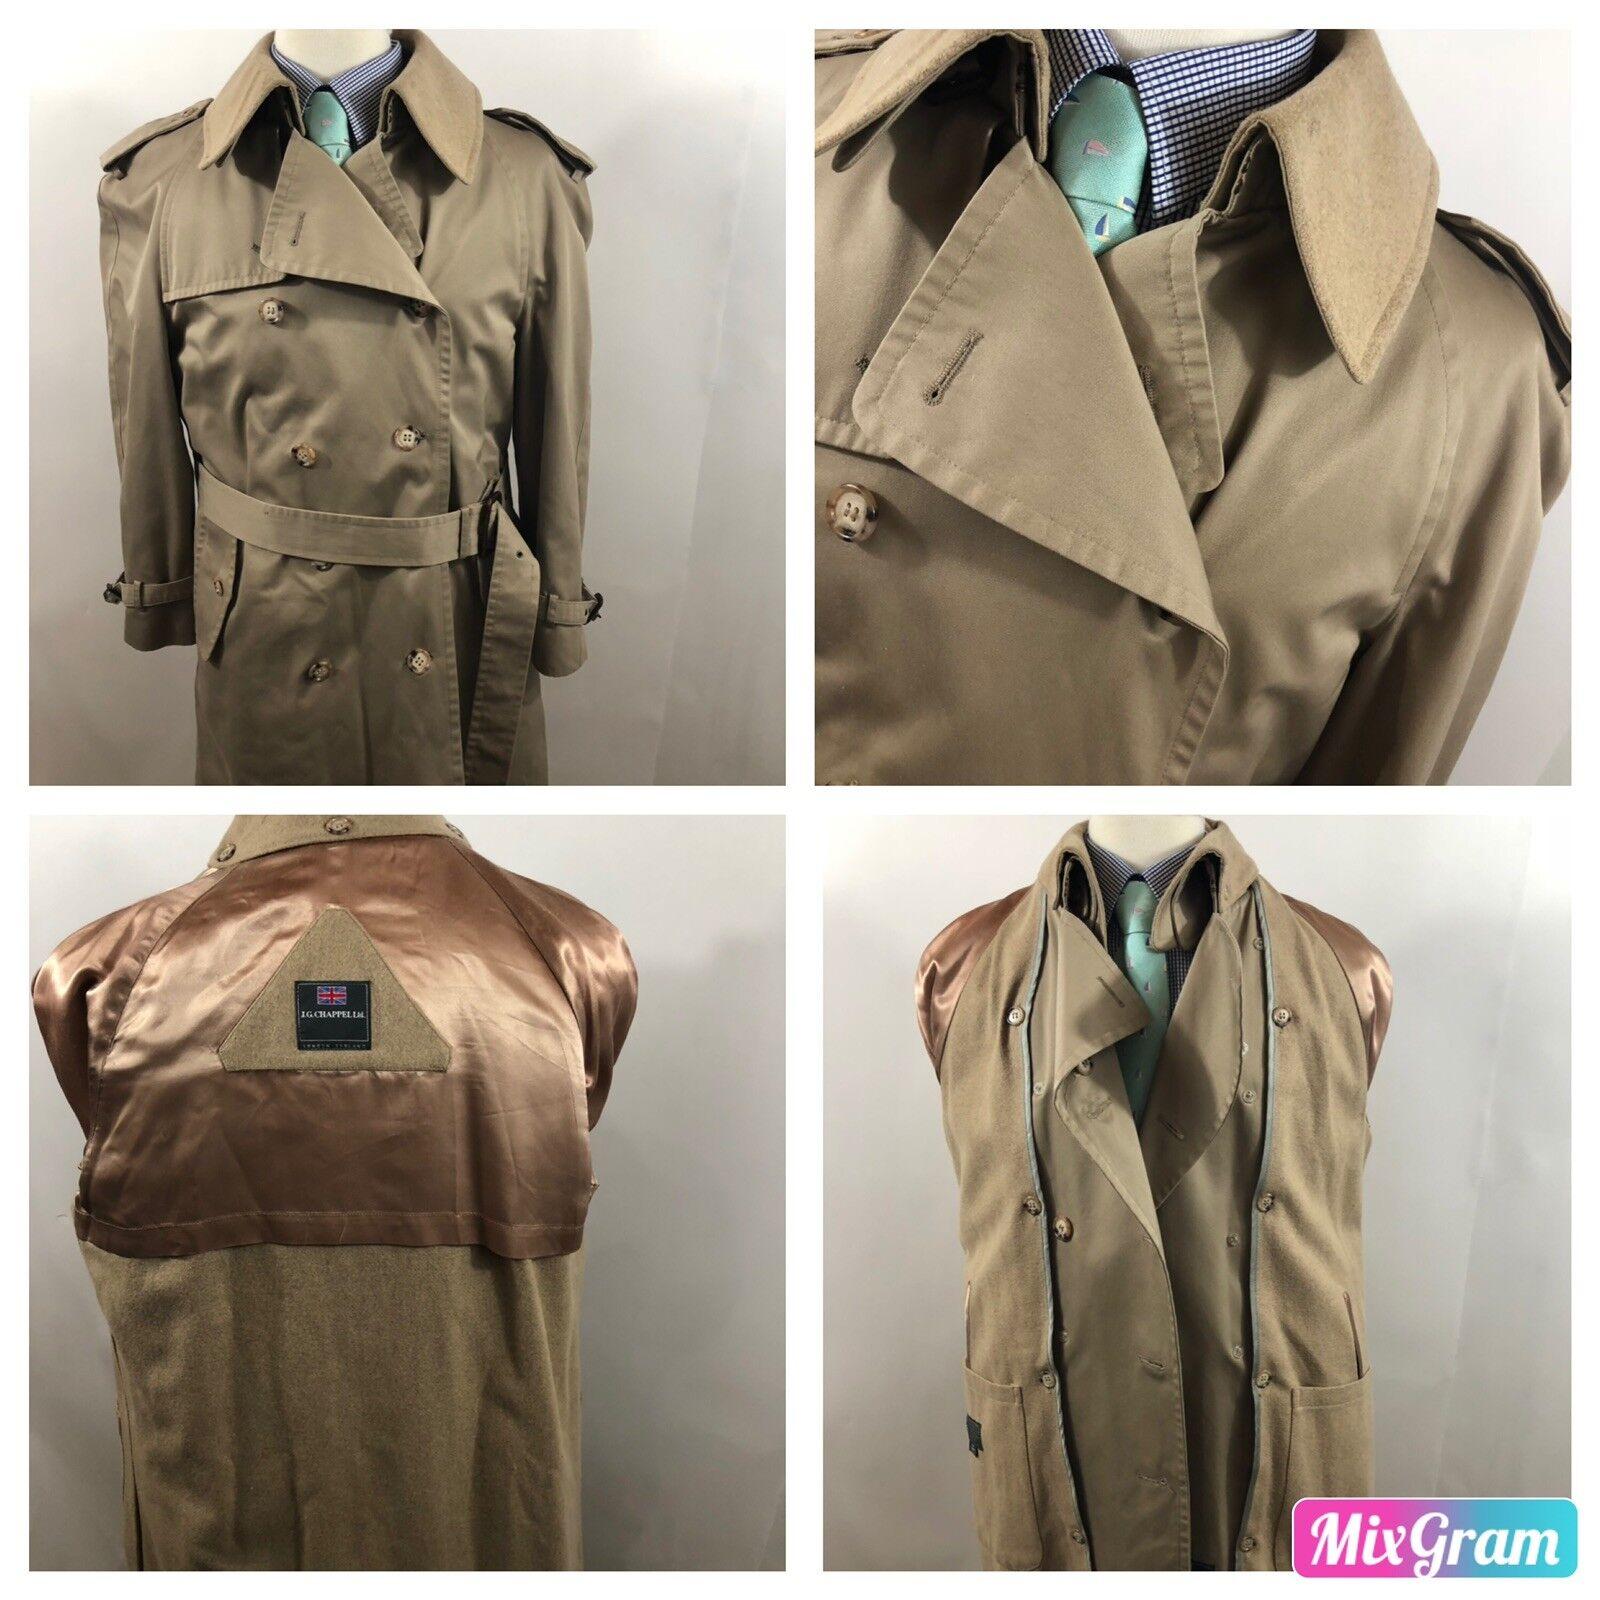 JG Chappel Men's Tan Winter Trench Coat Lined Single Vent Wool Blend Sz 40 S P7